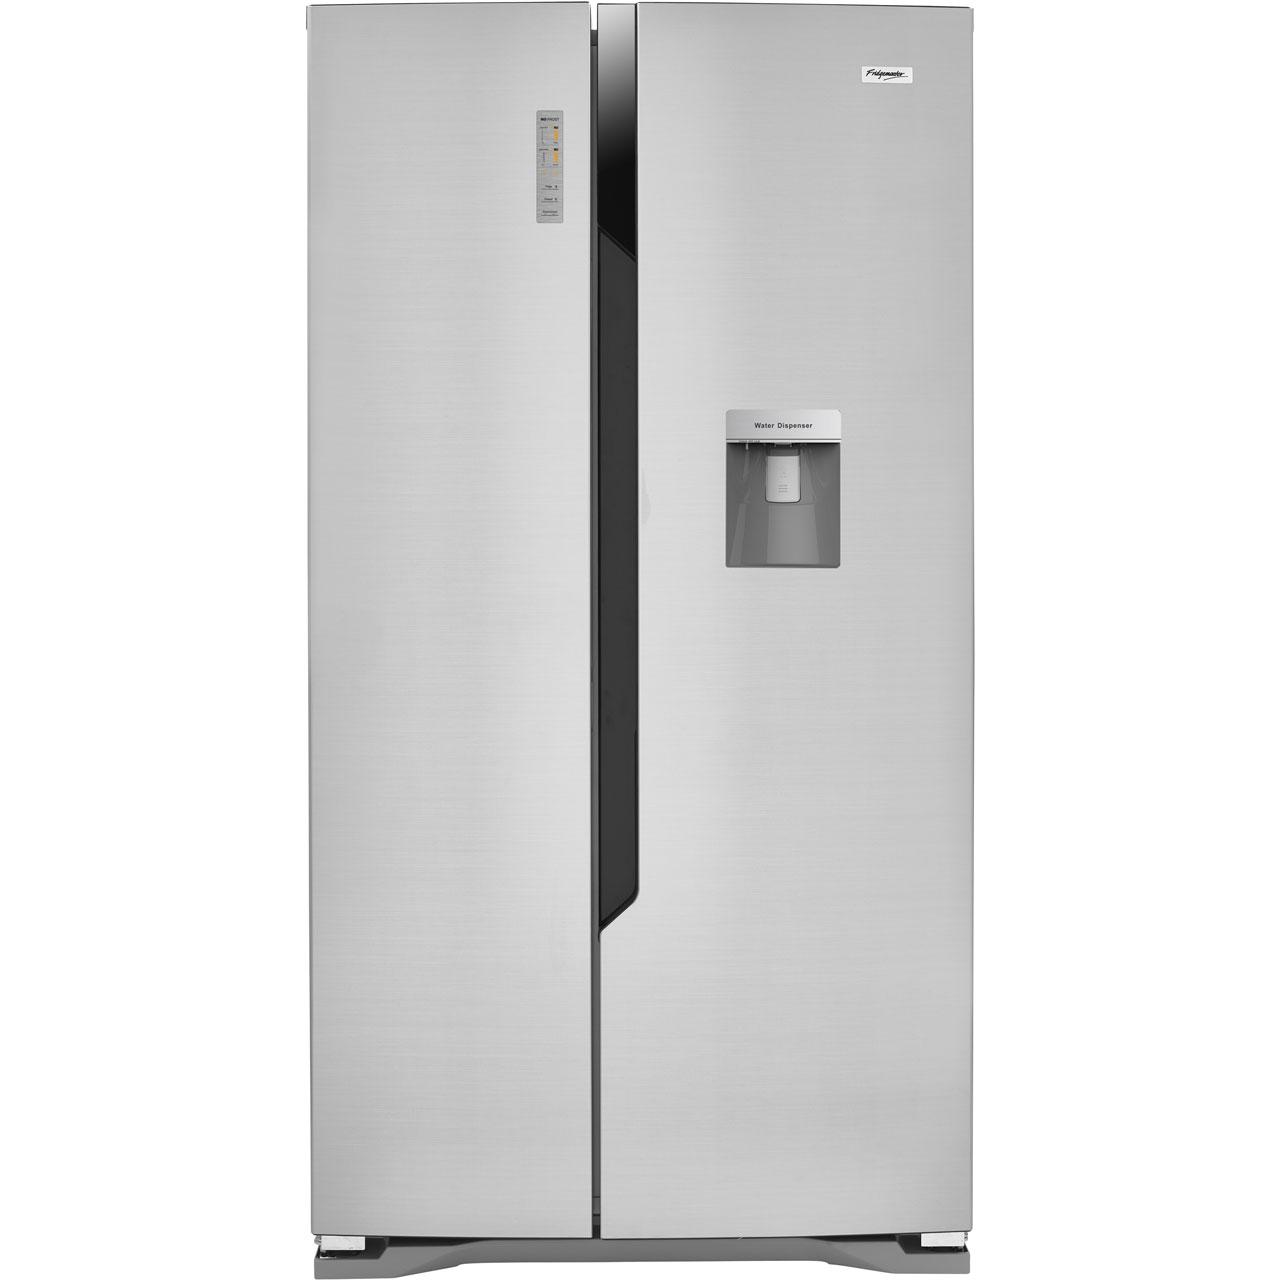 Fridgemaster MS91515DFF Free Standing American Fridge Freezer in Silver